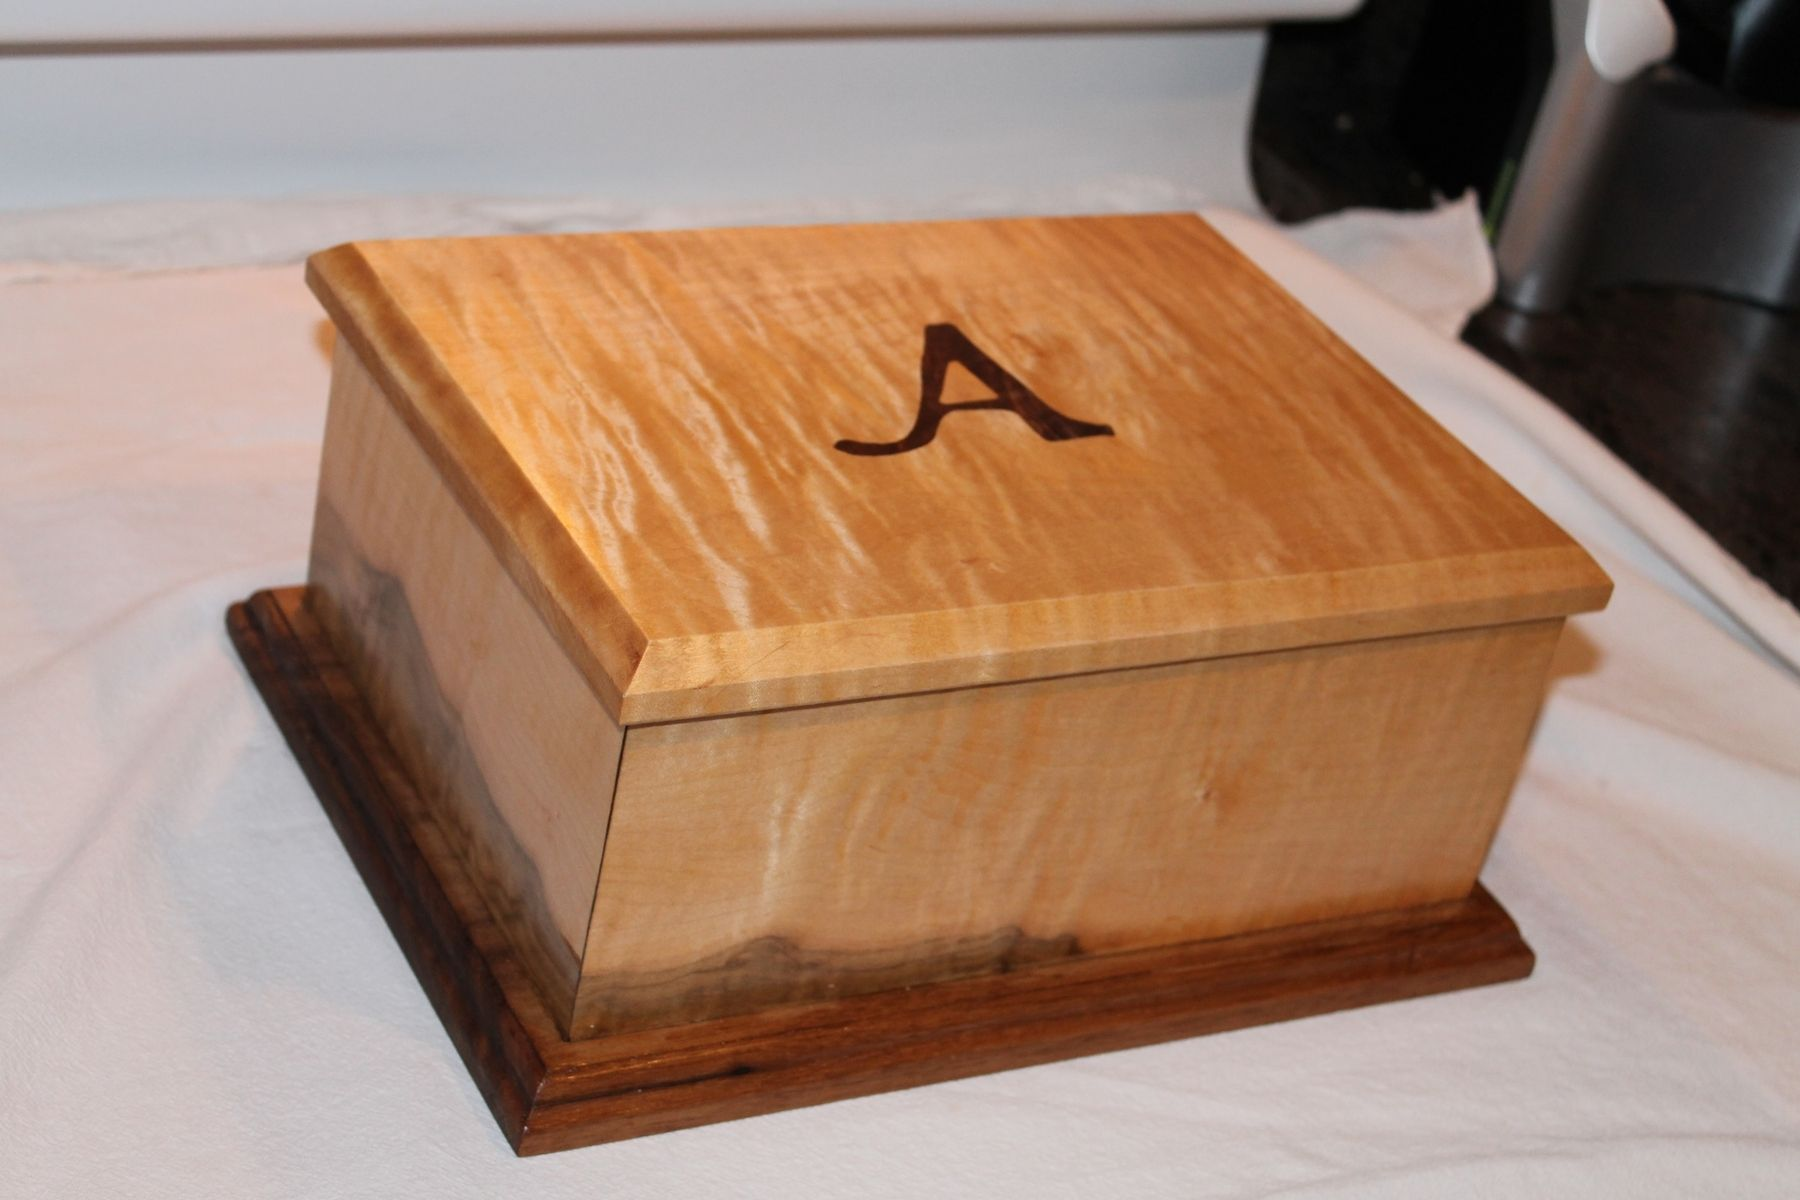 Hand Crafted Jewelry Keepsake Box Curly Maple Walnut